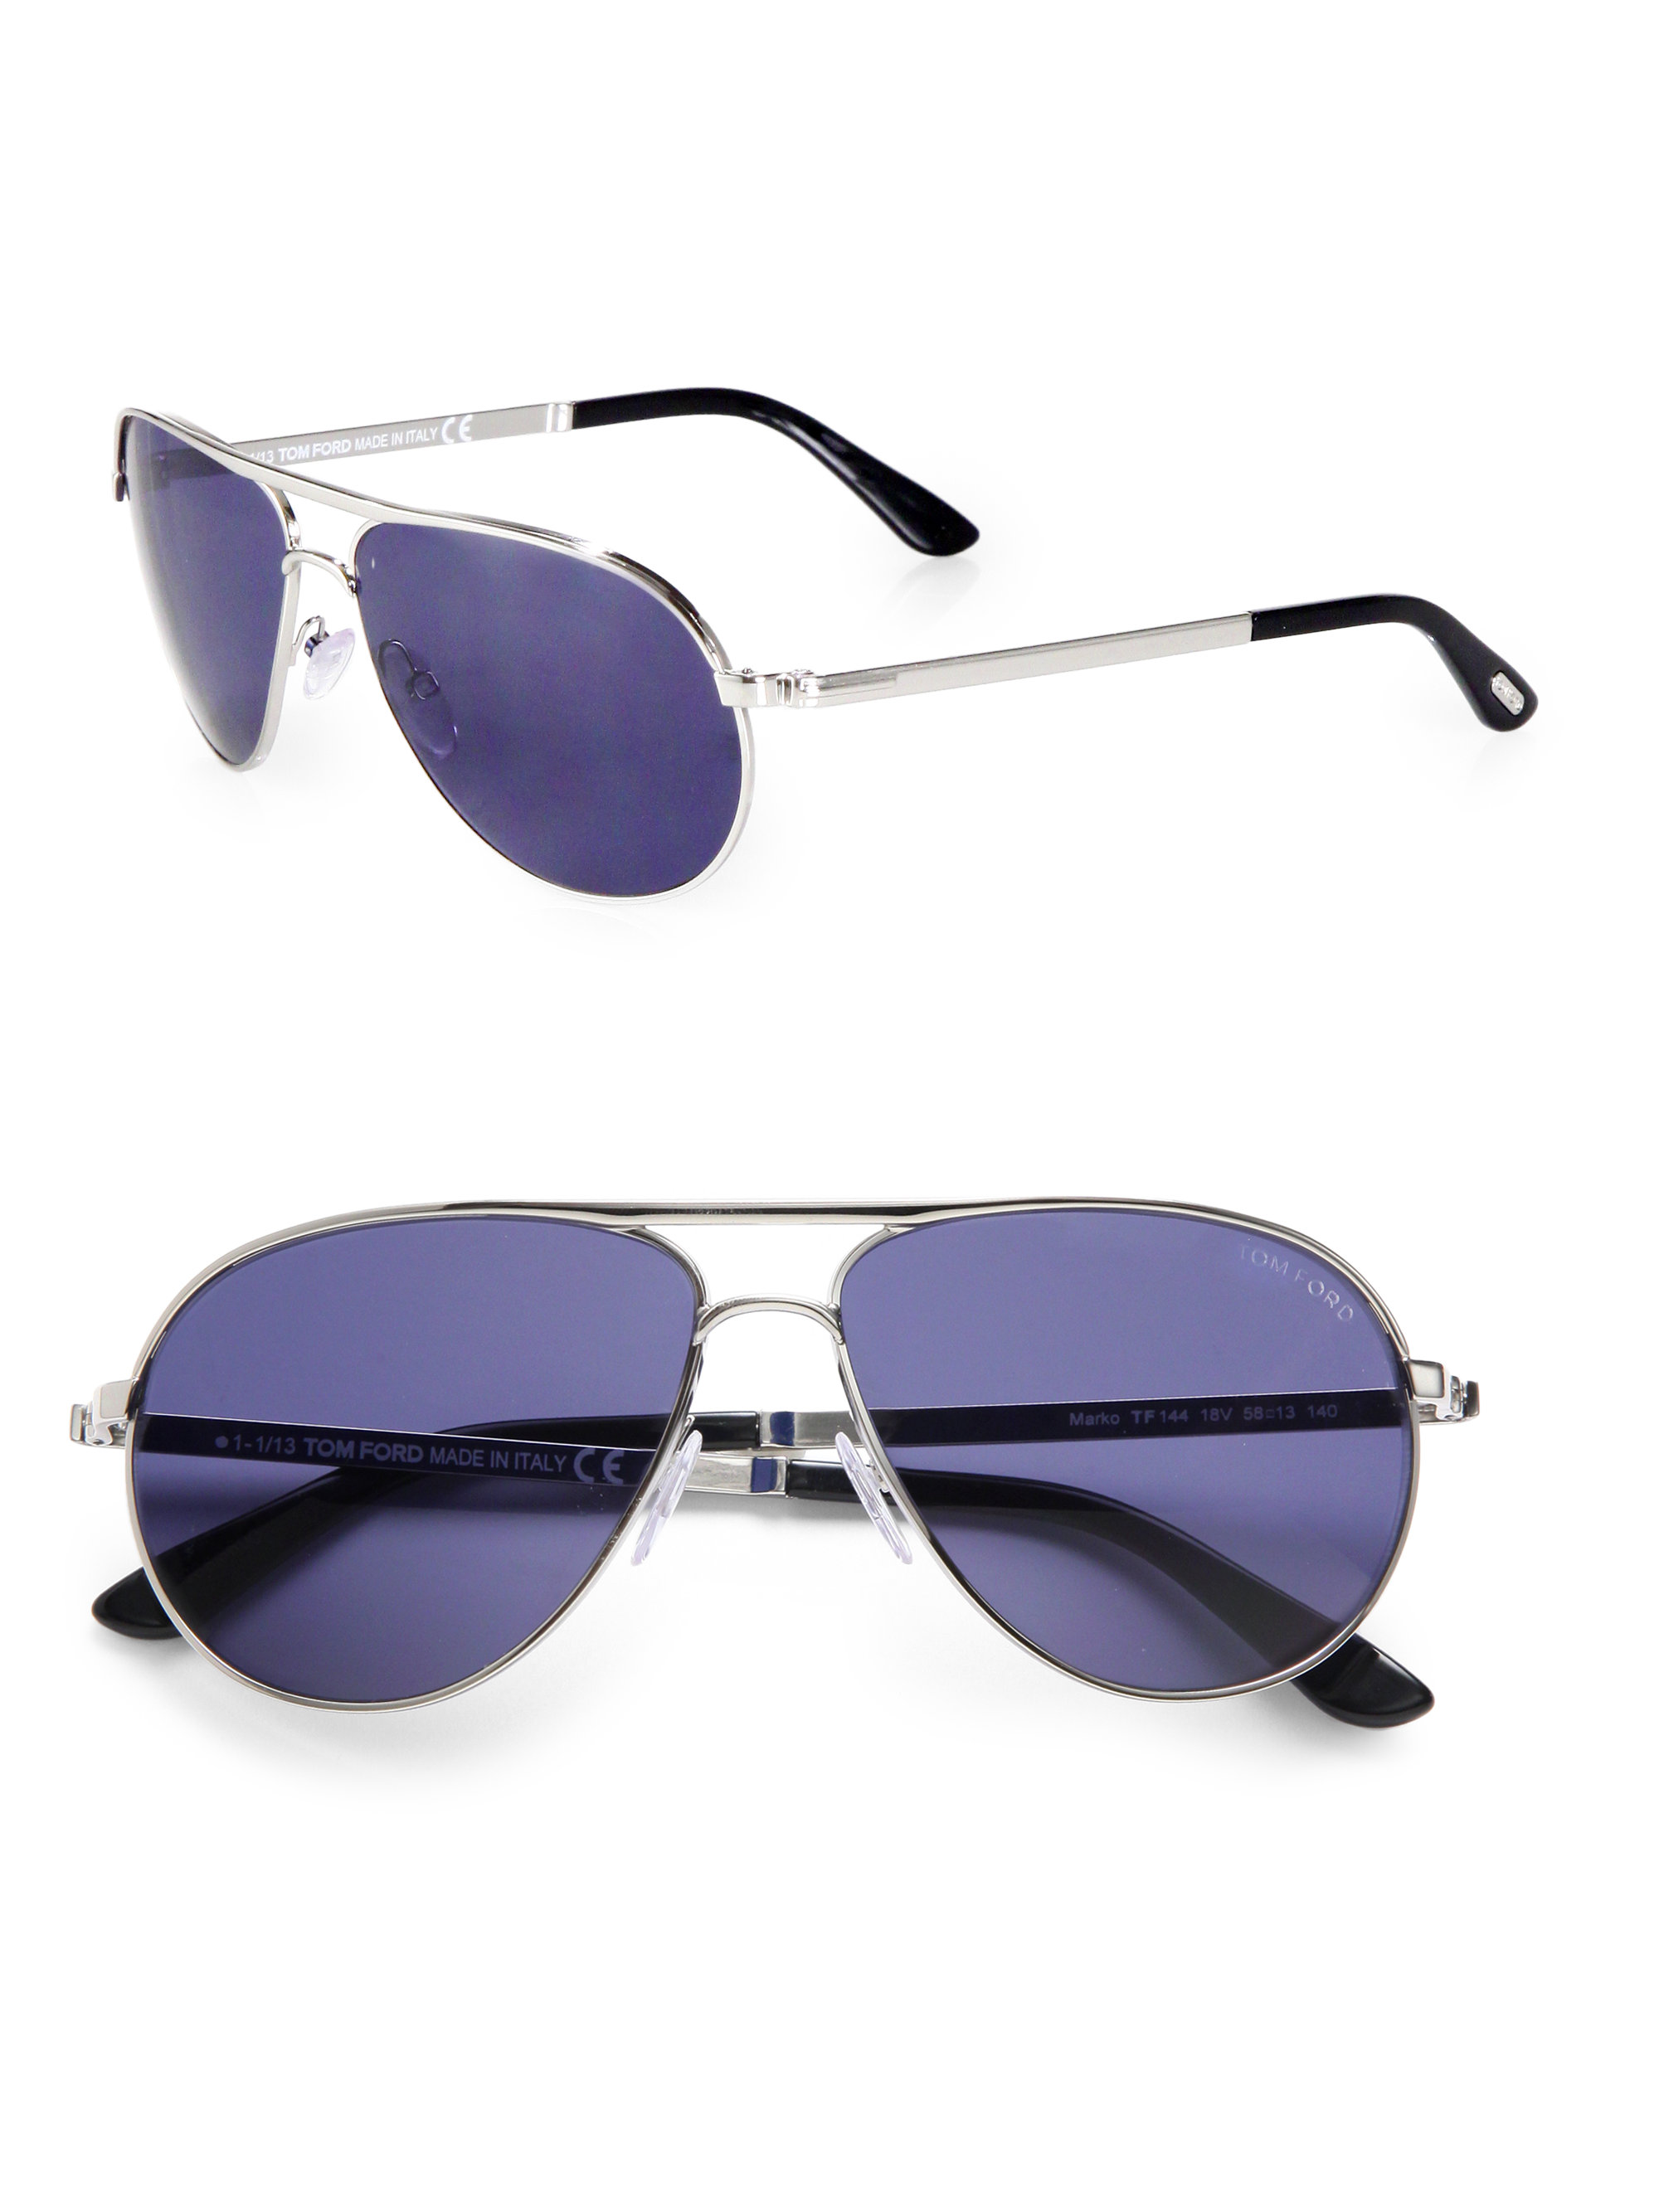 dda6822f2e55 Lyst - Tom Ford Marko Metal Aviator Sunglasses in Blue for Men